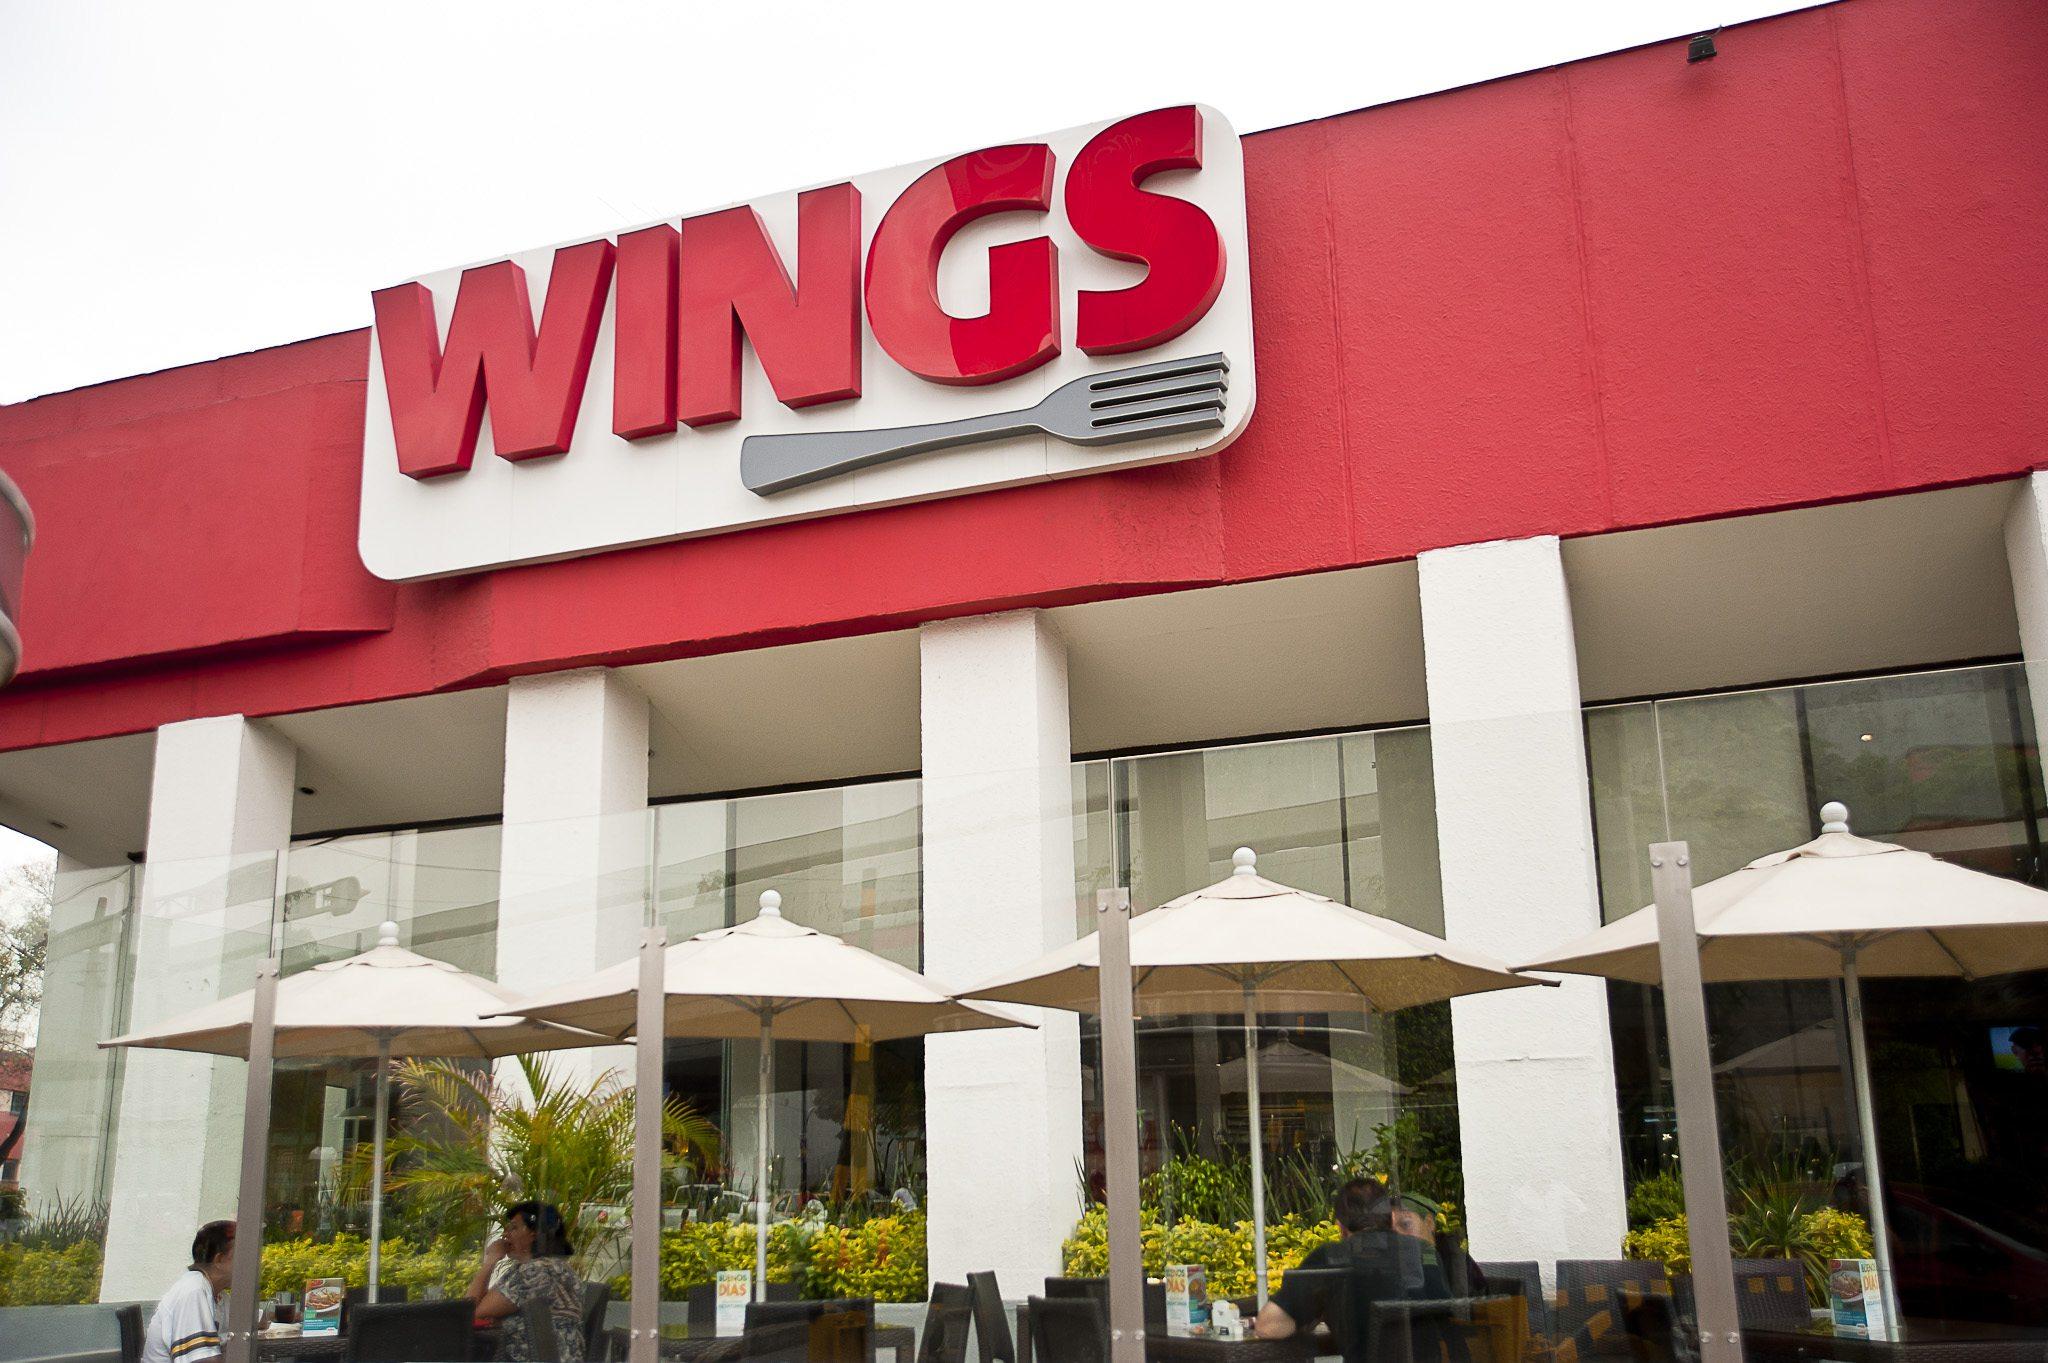 CMR transferirá 6 sucursales Wings a Grupo Gigante